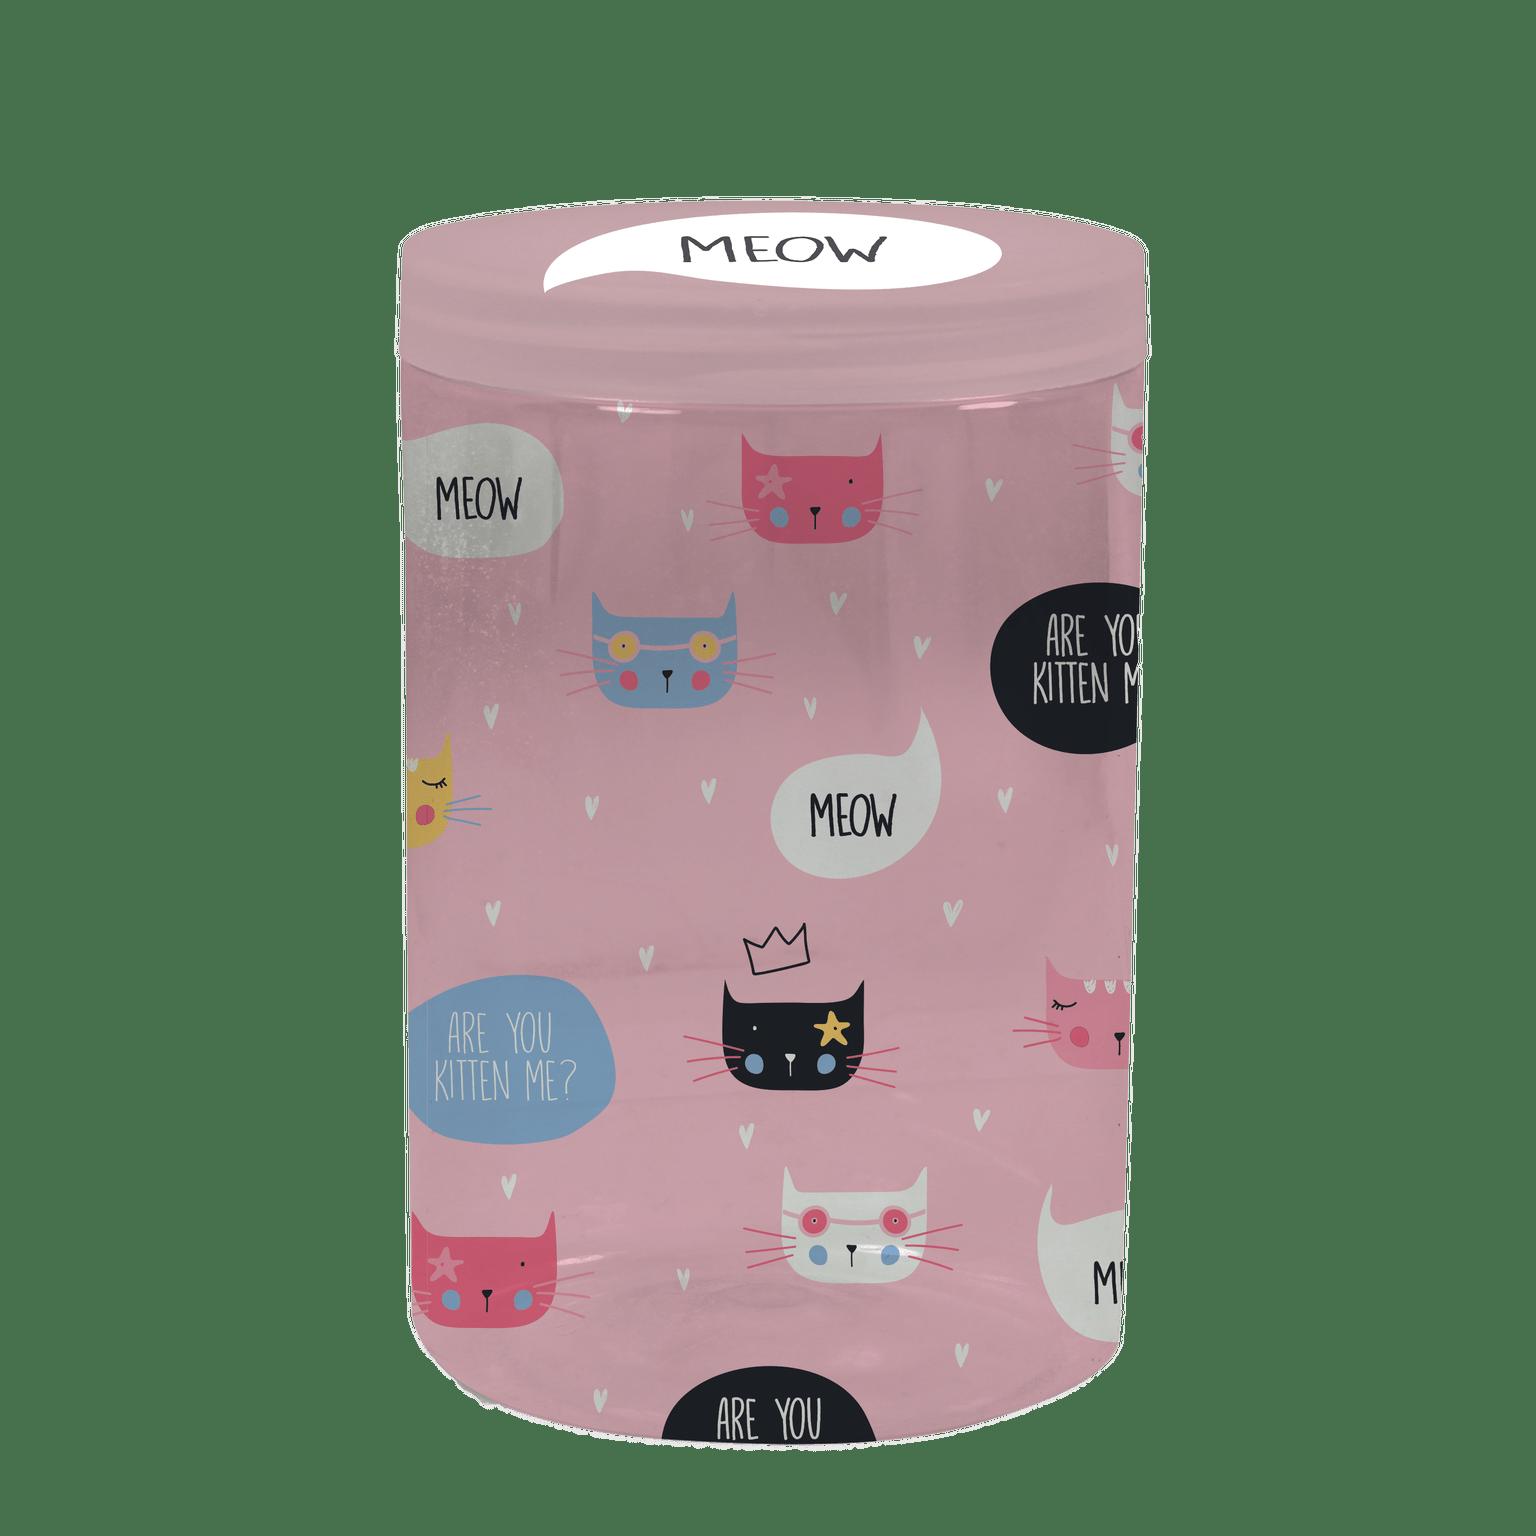 Circle gift box kitten - Minene3